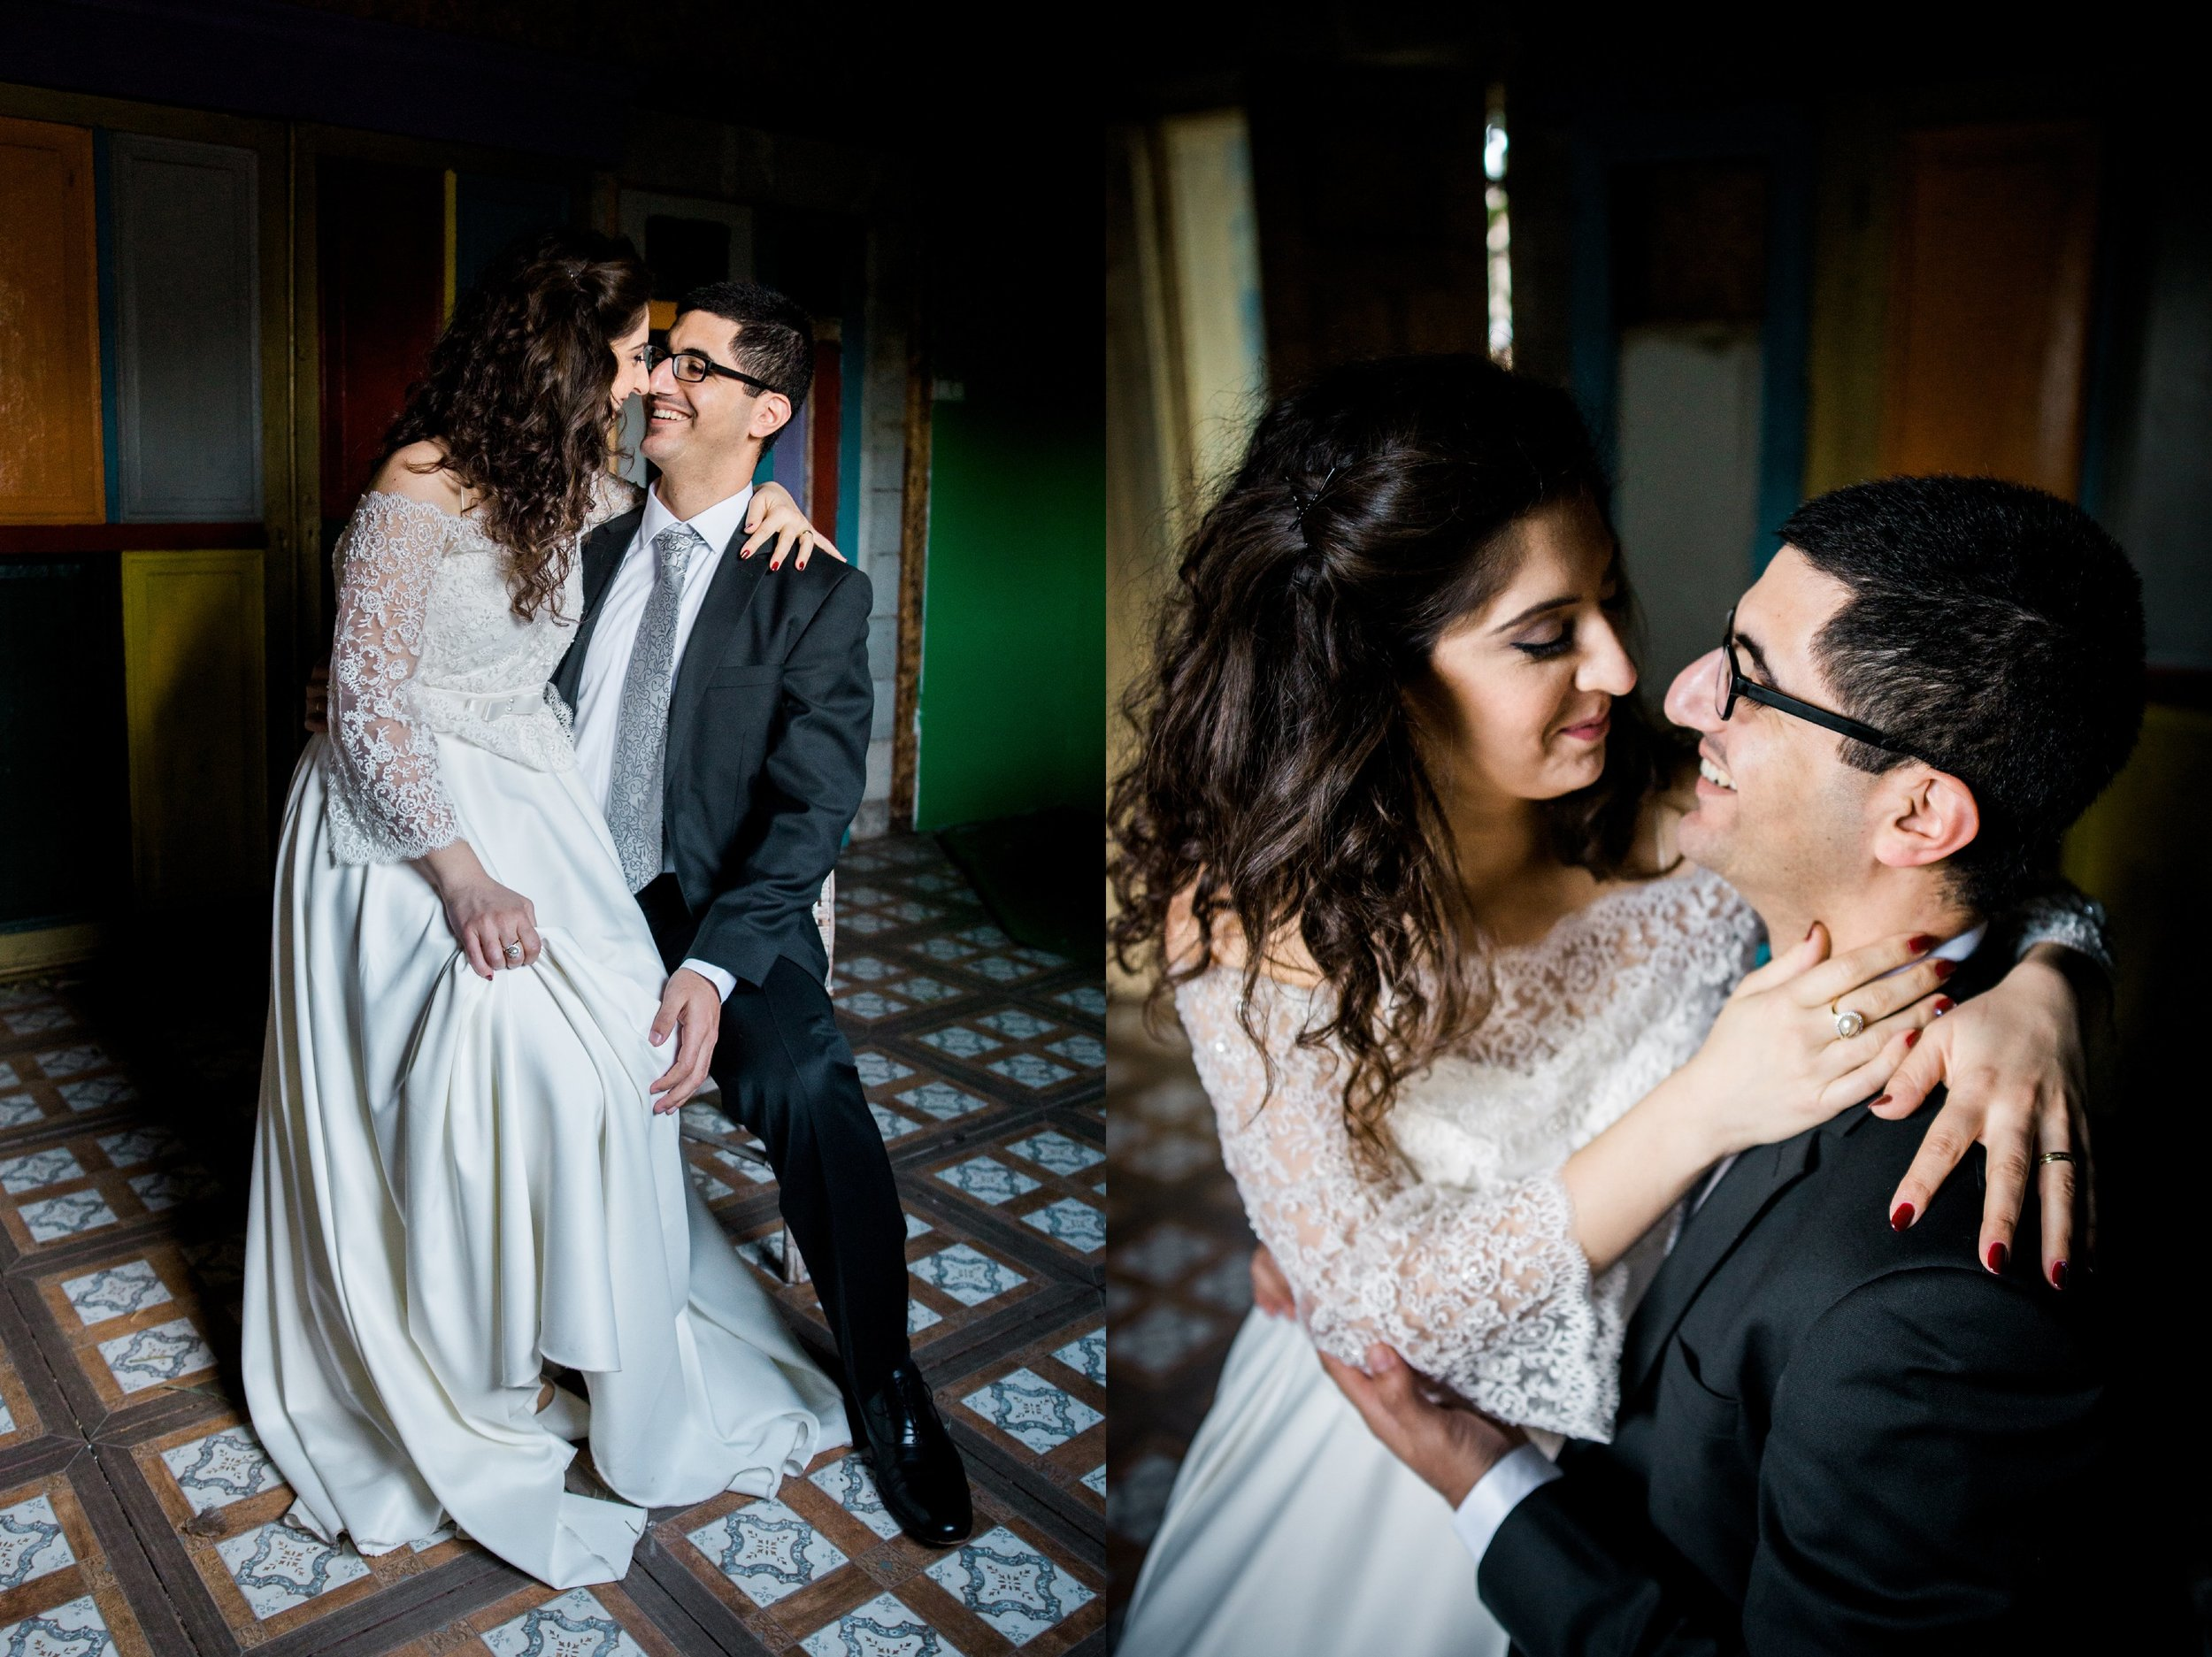 israel-garden-wedding-portraits-session-kate-giryes-photography--49_WEB.jpg